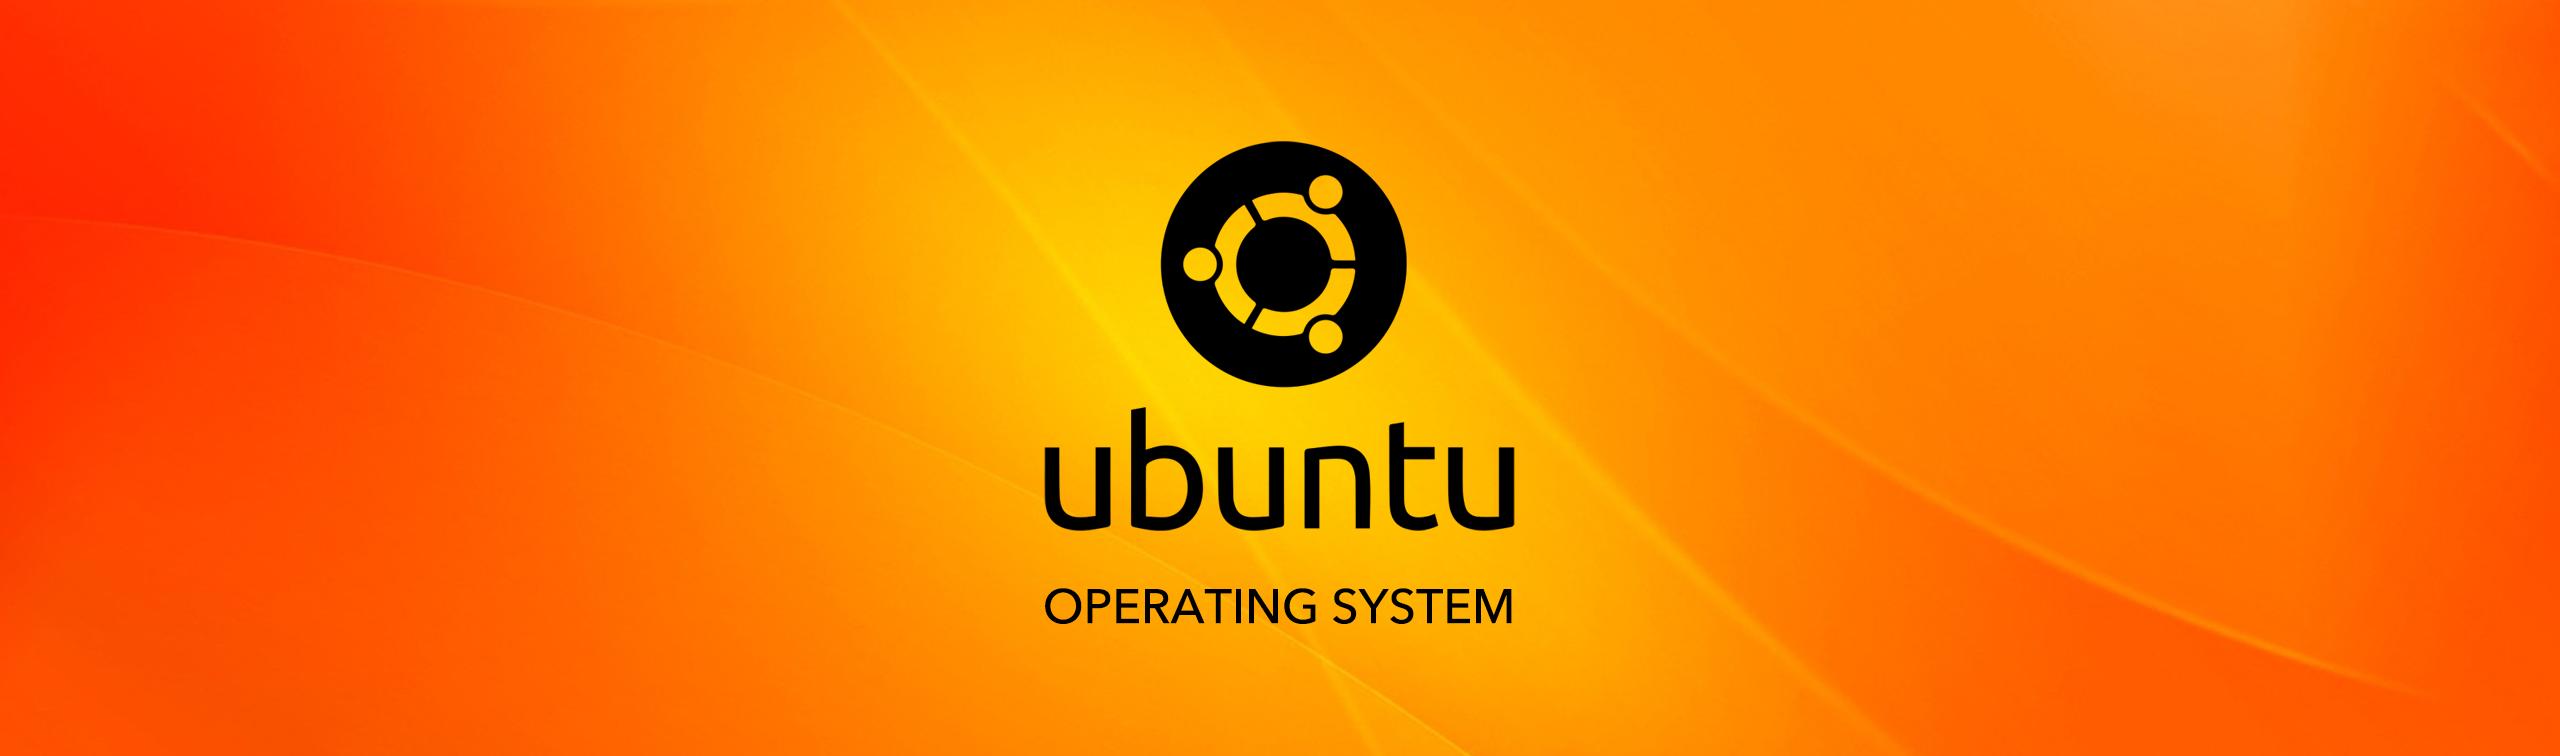 Cluster Server Operating System Ubuntu 18.04